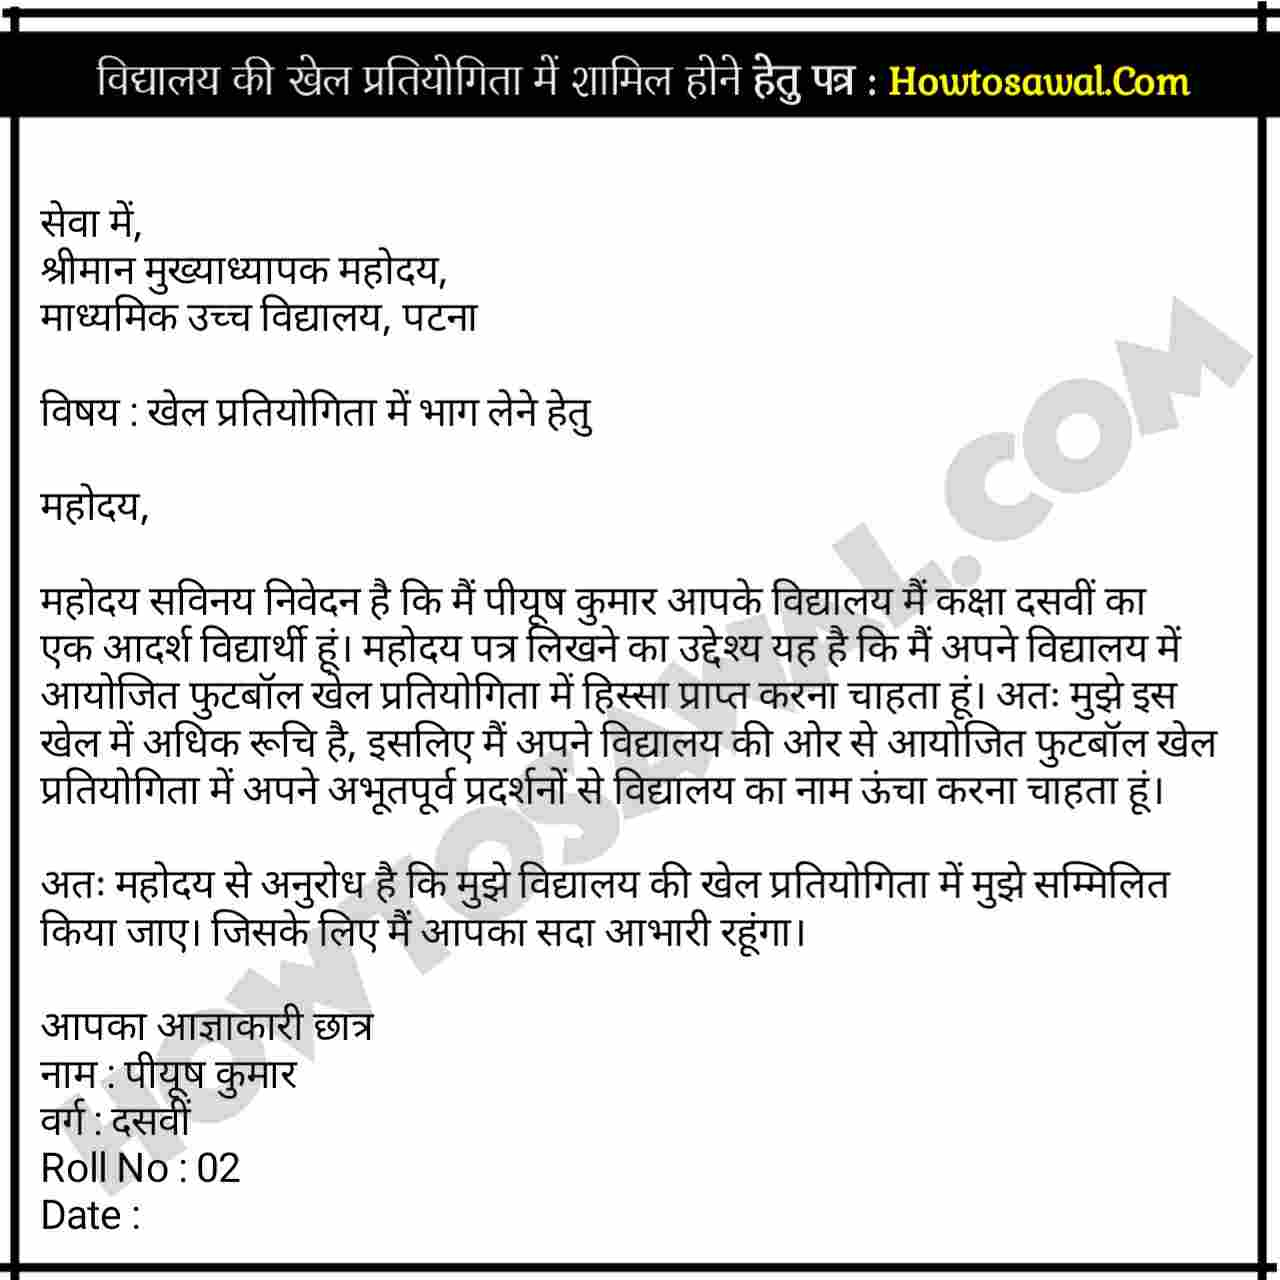 School/Collage Ki Khel Competition Ke Bhag Lene हेतु पत्र